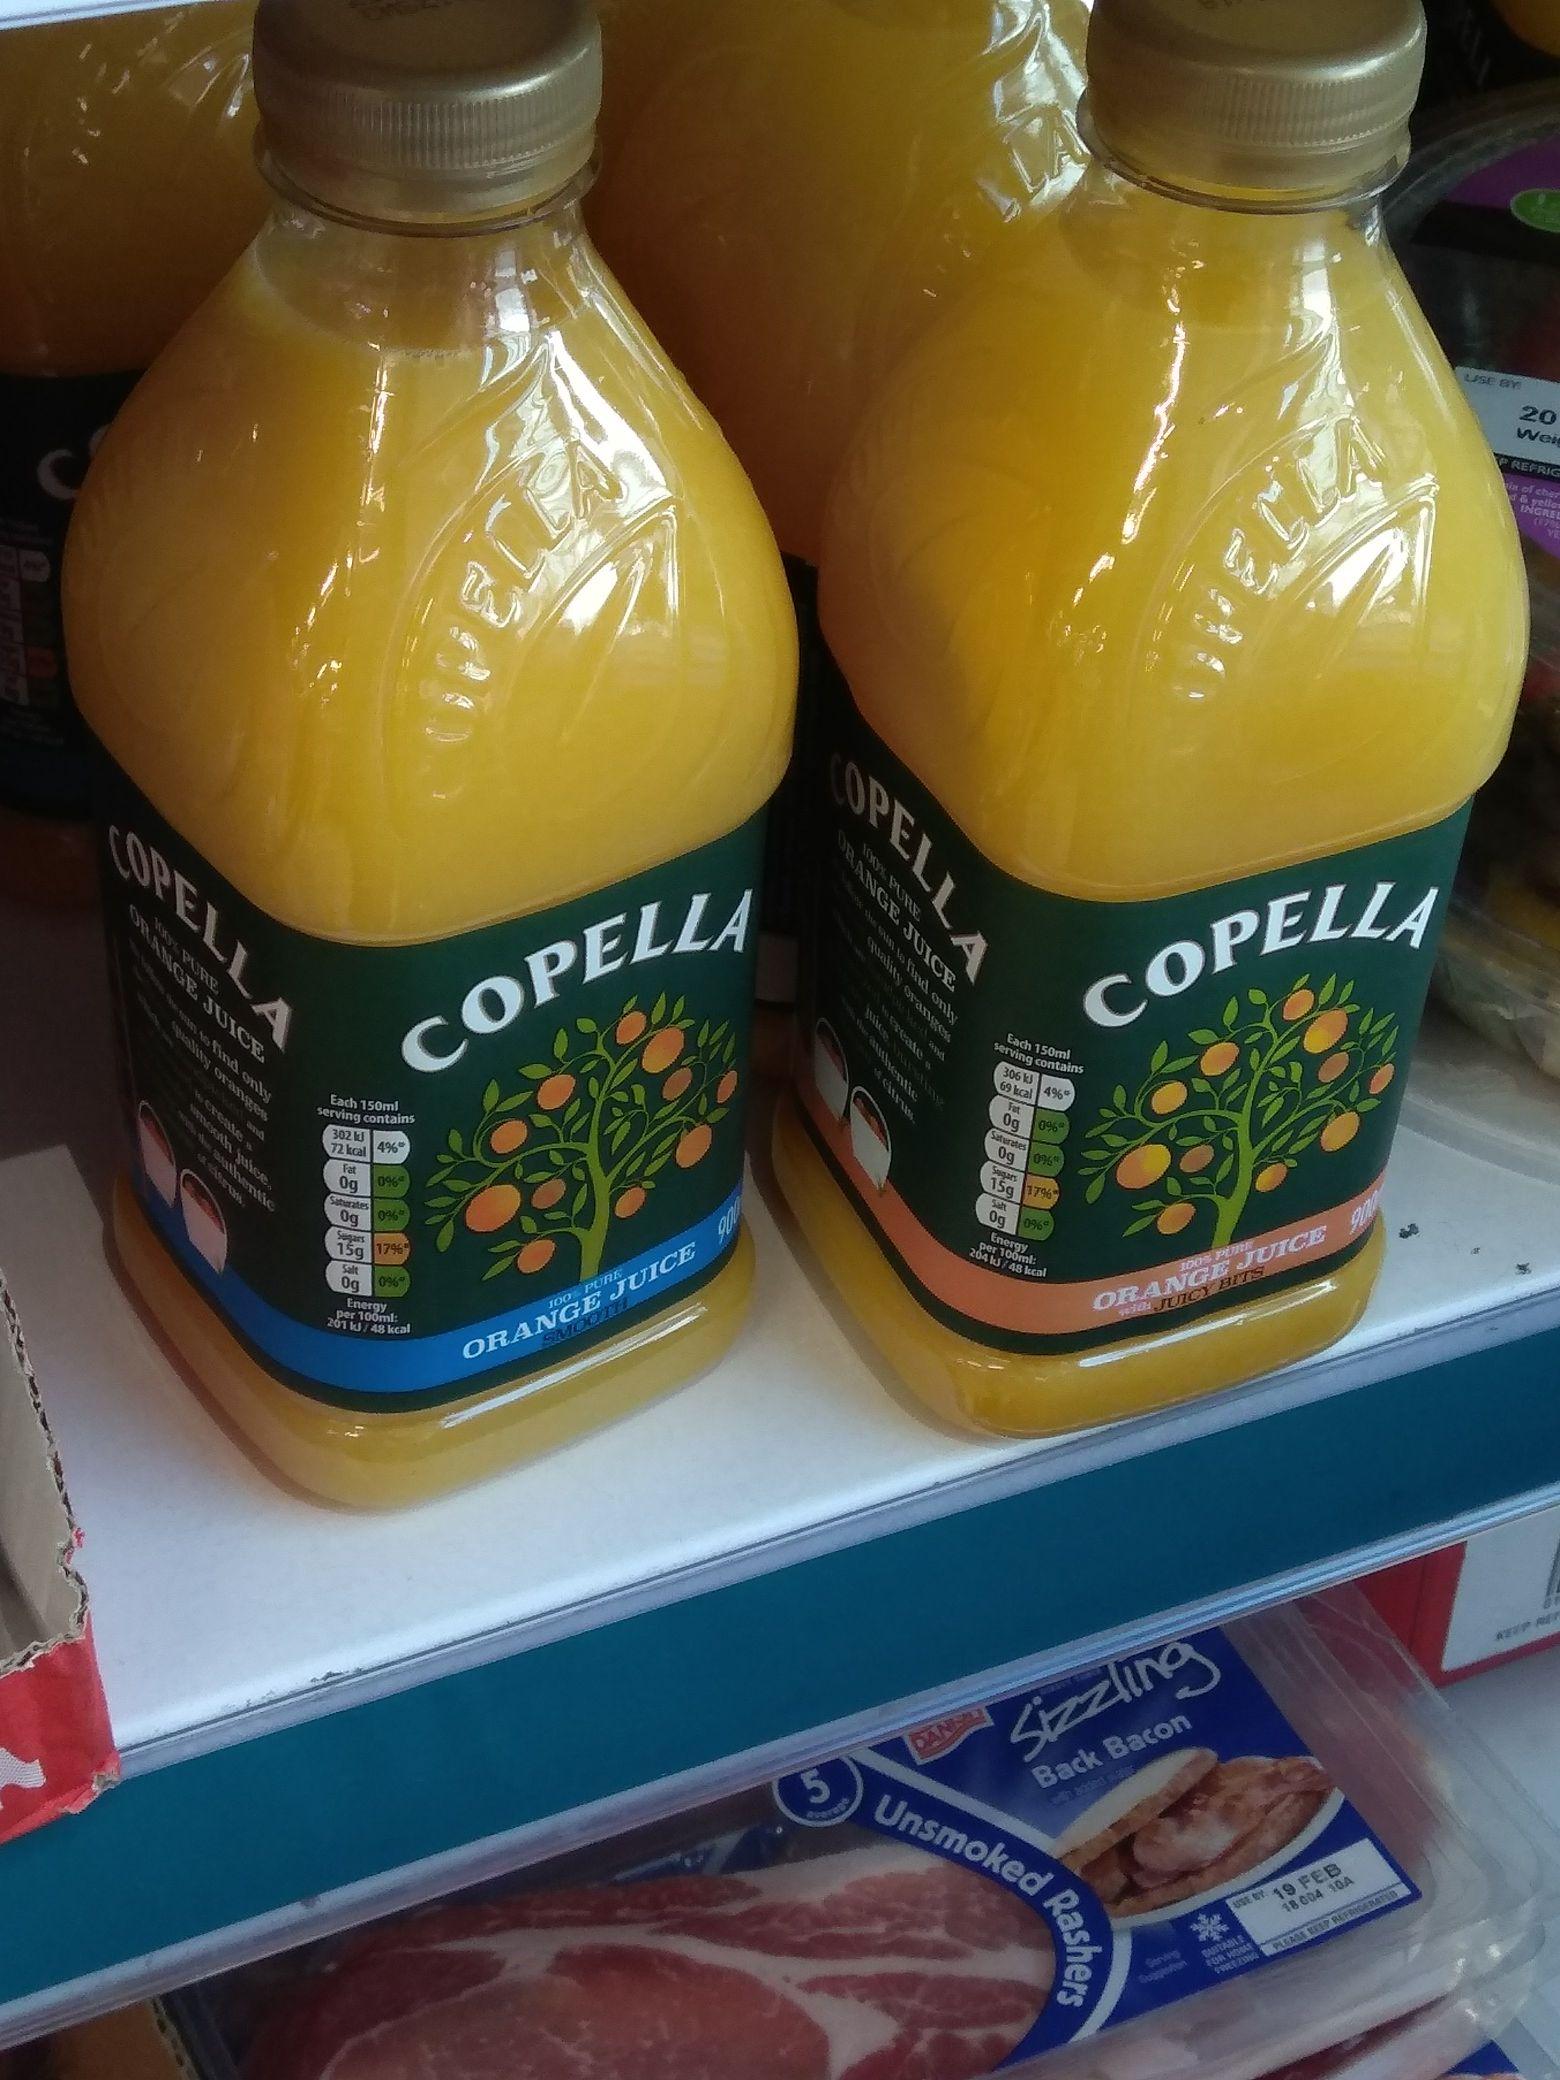 Copella 100% pure orange juice 900ml - £1 @ Poundland Leeds Crown Point